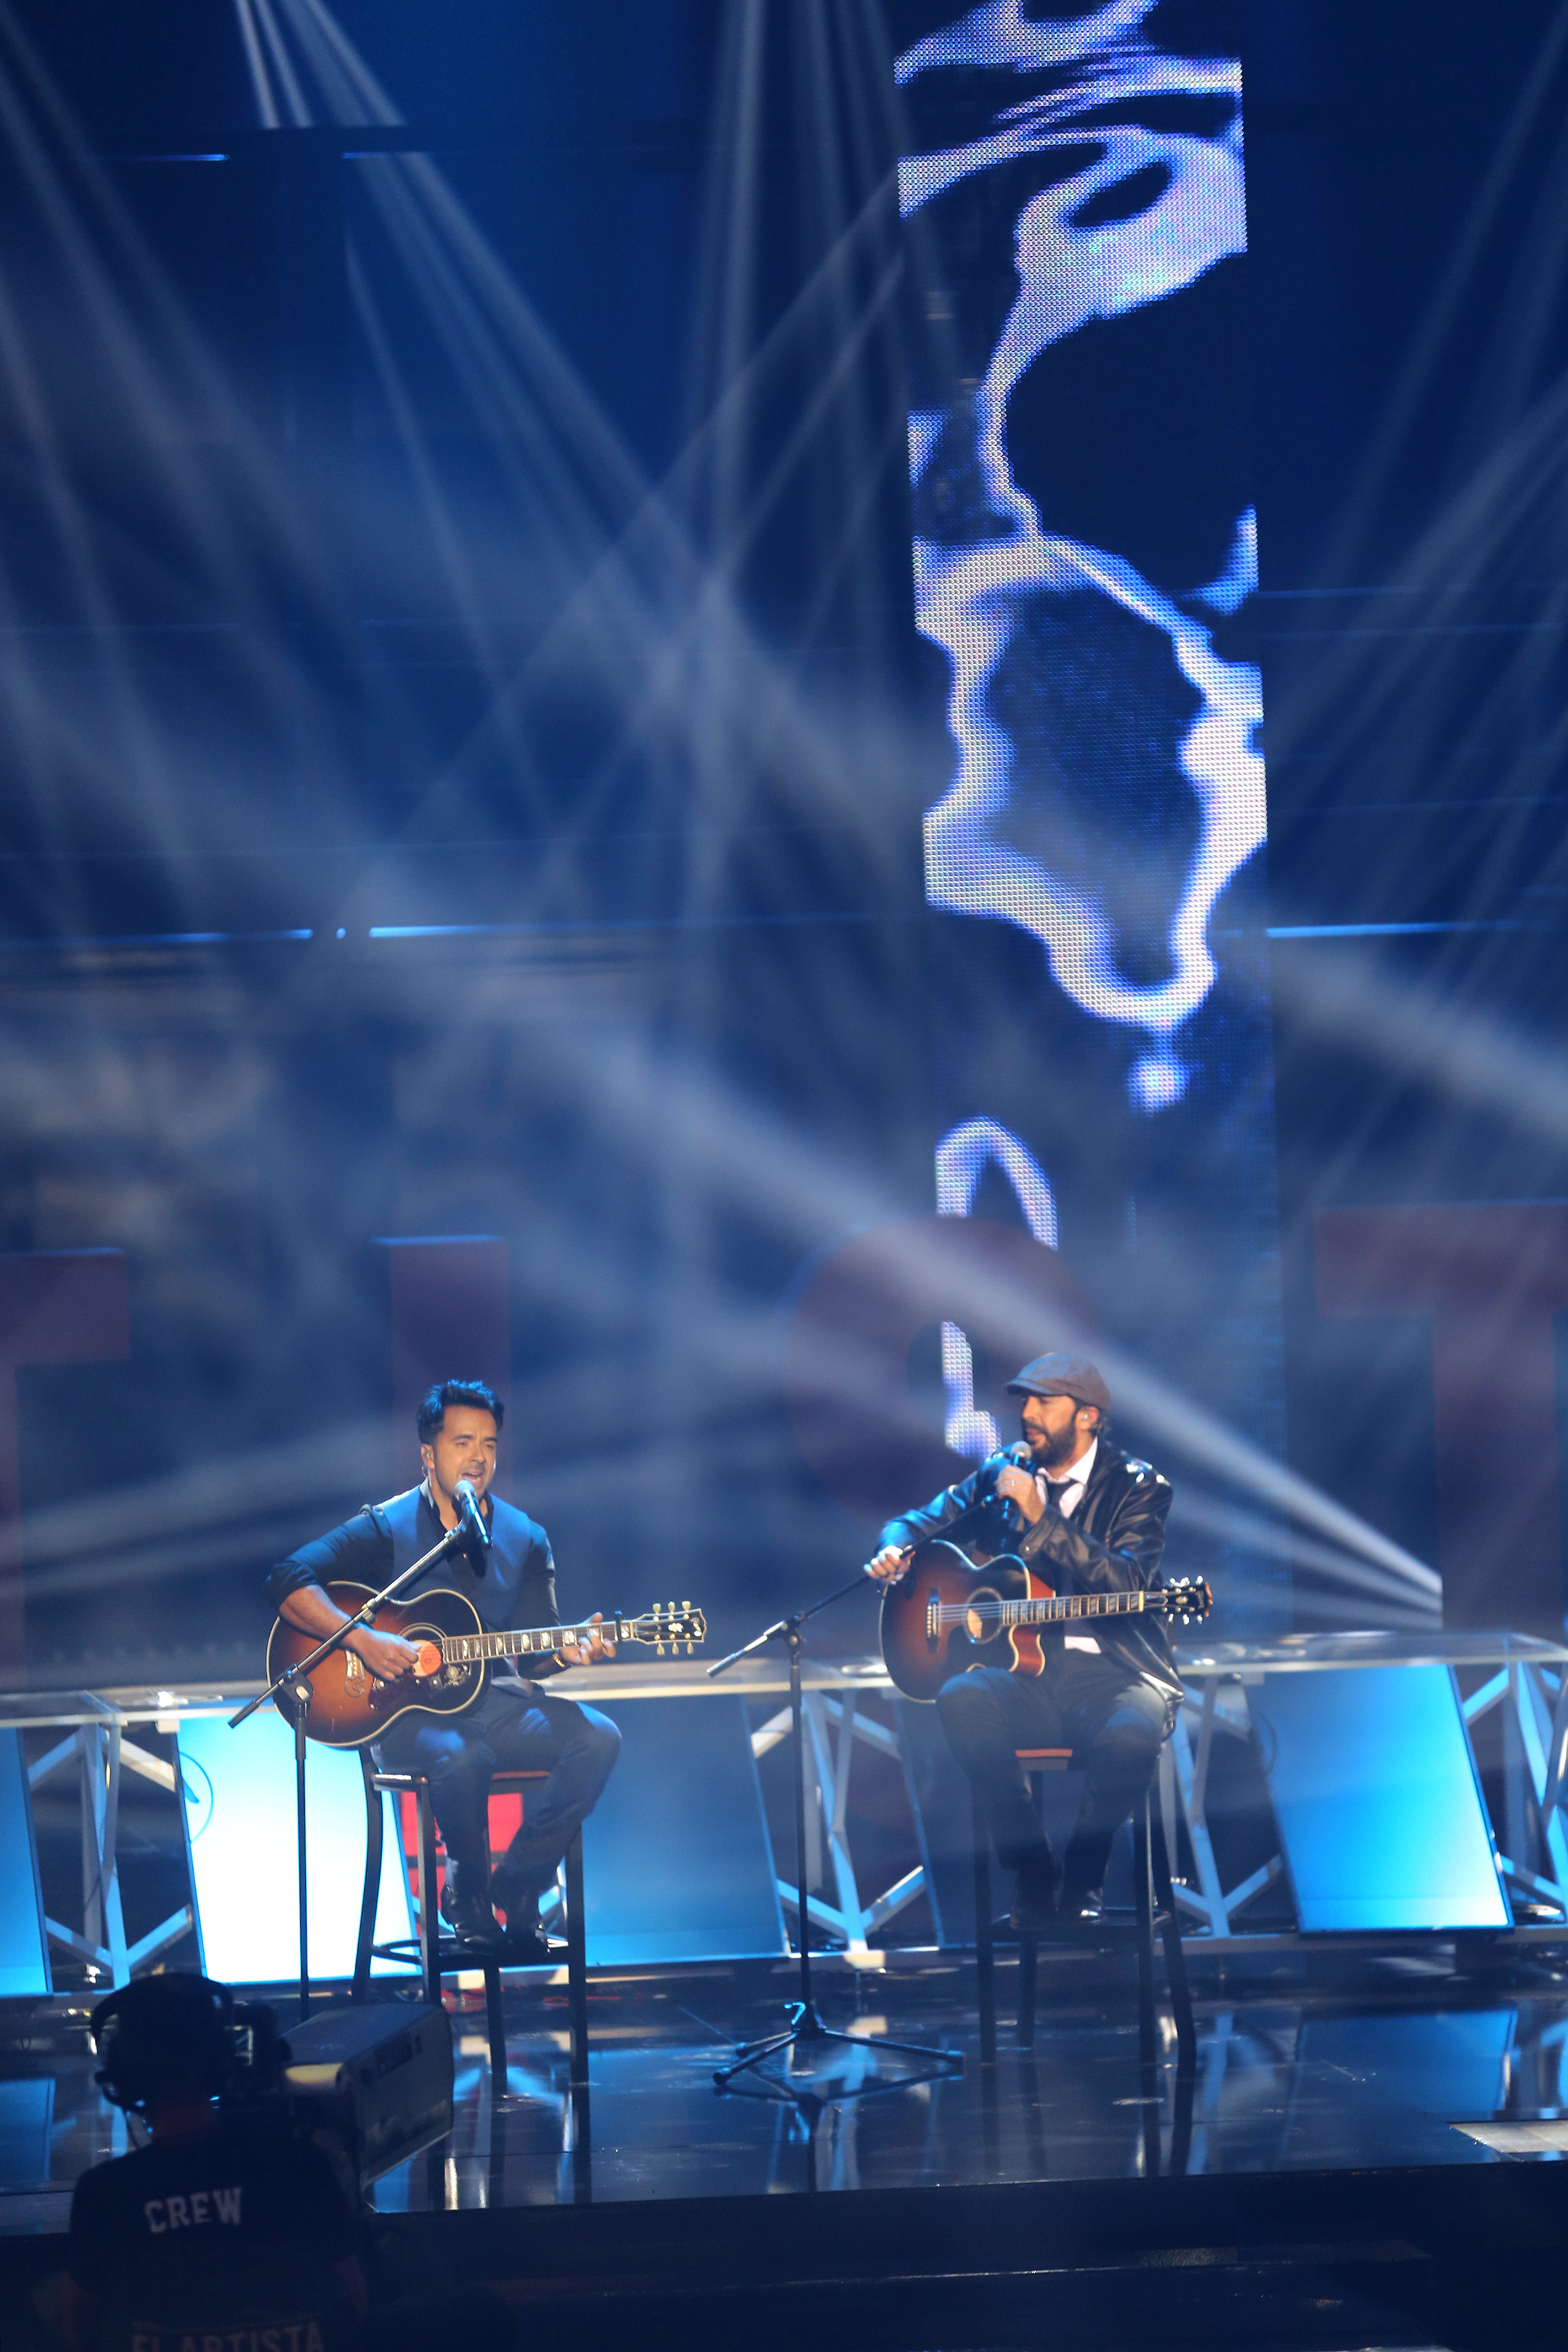 YO SOY EL ARTISTA -- Season:1 -- Pictured: (l-r) Luis Fonsi, Juan Luis Guerra -- (Photo by: Josh McComas/Telemundo)